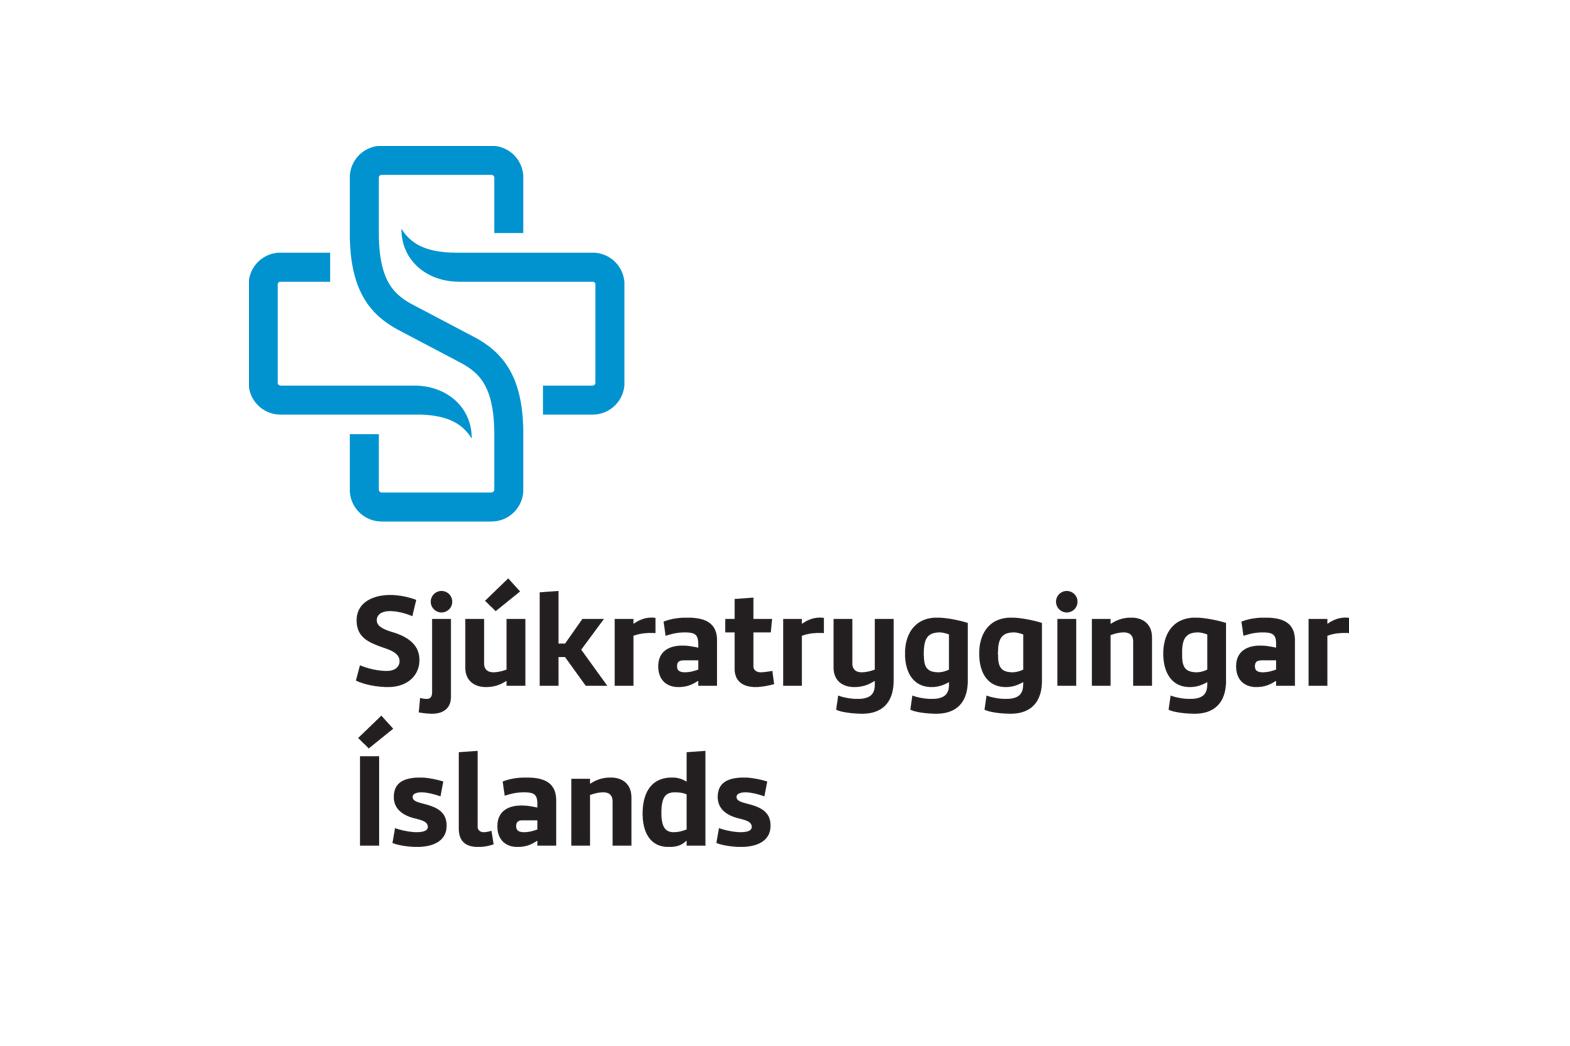 Sjúkratryggingar Íslands (Icelandic Health Insurance)